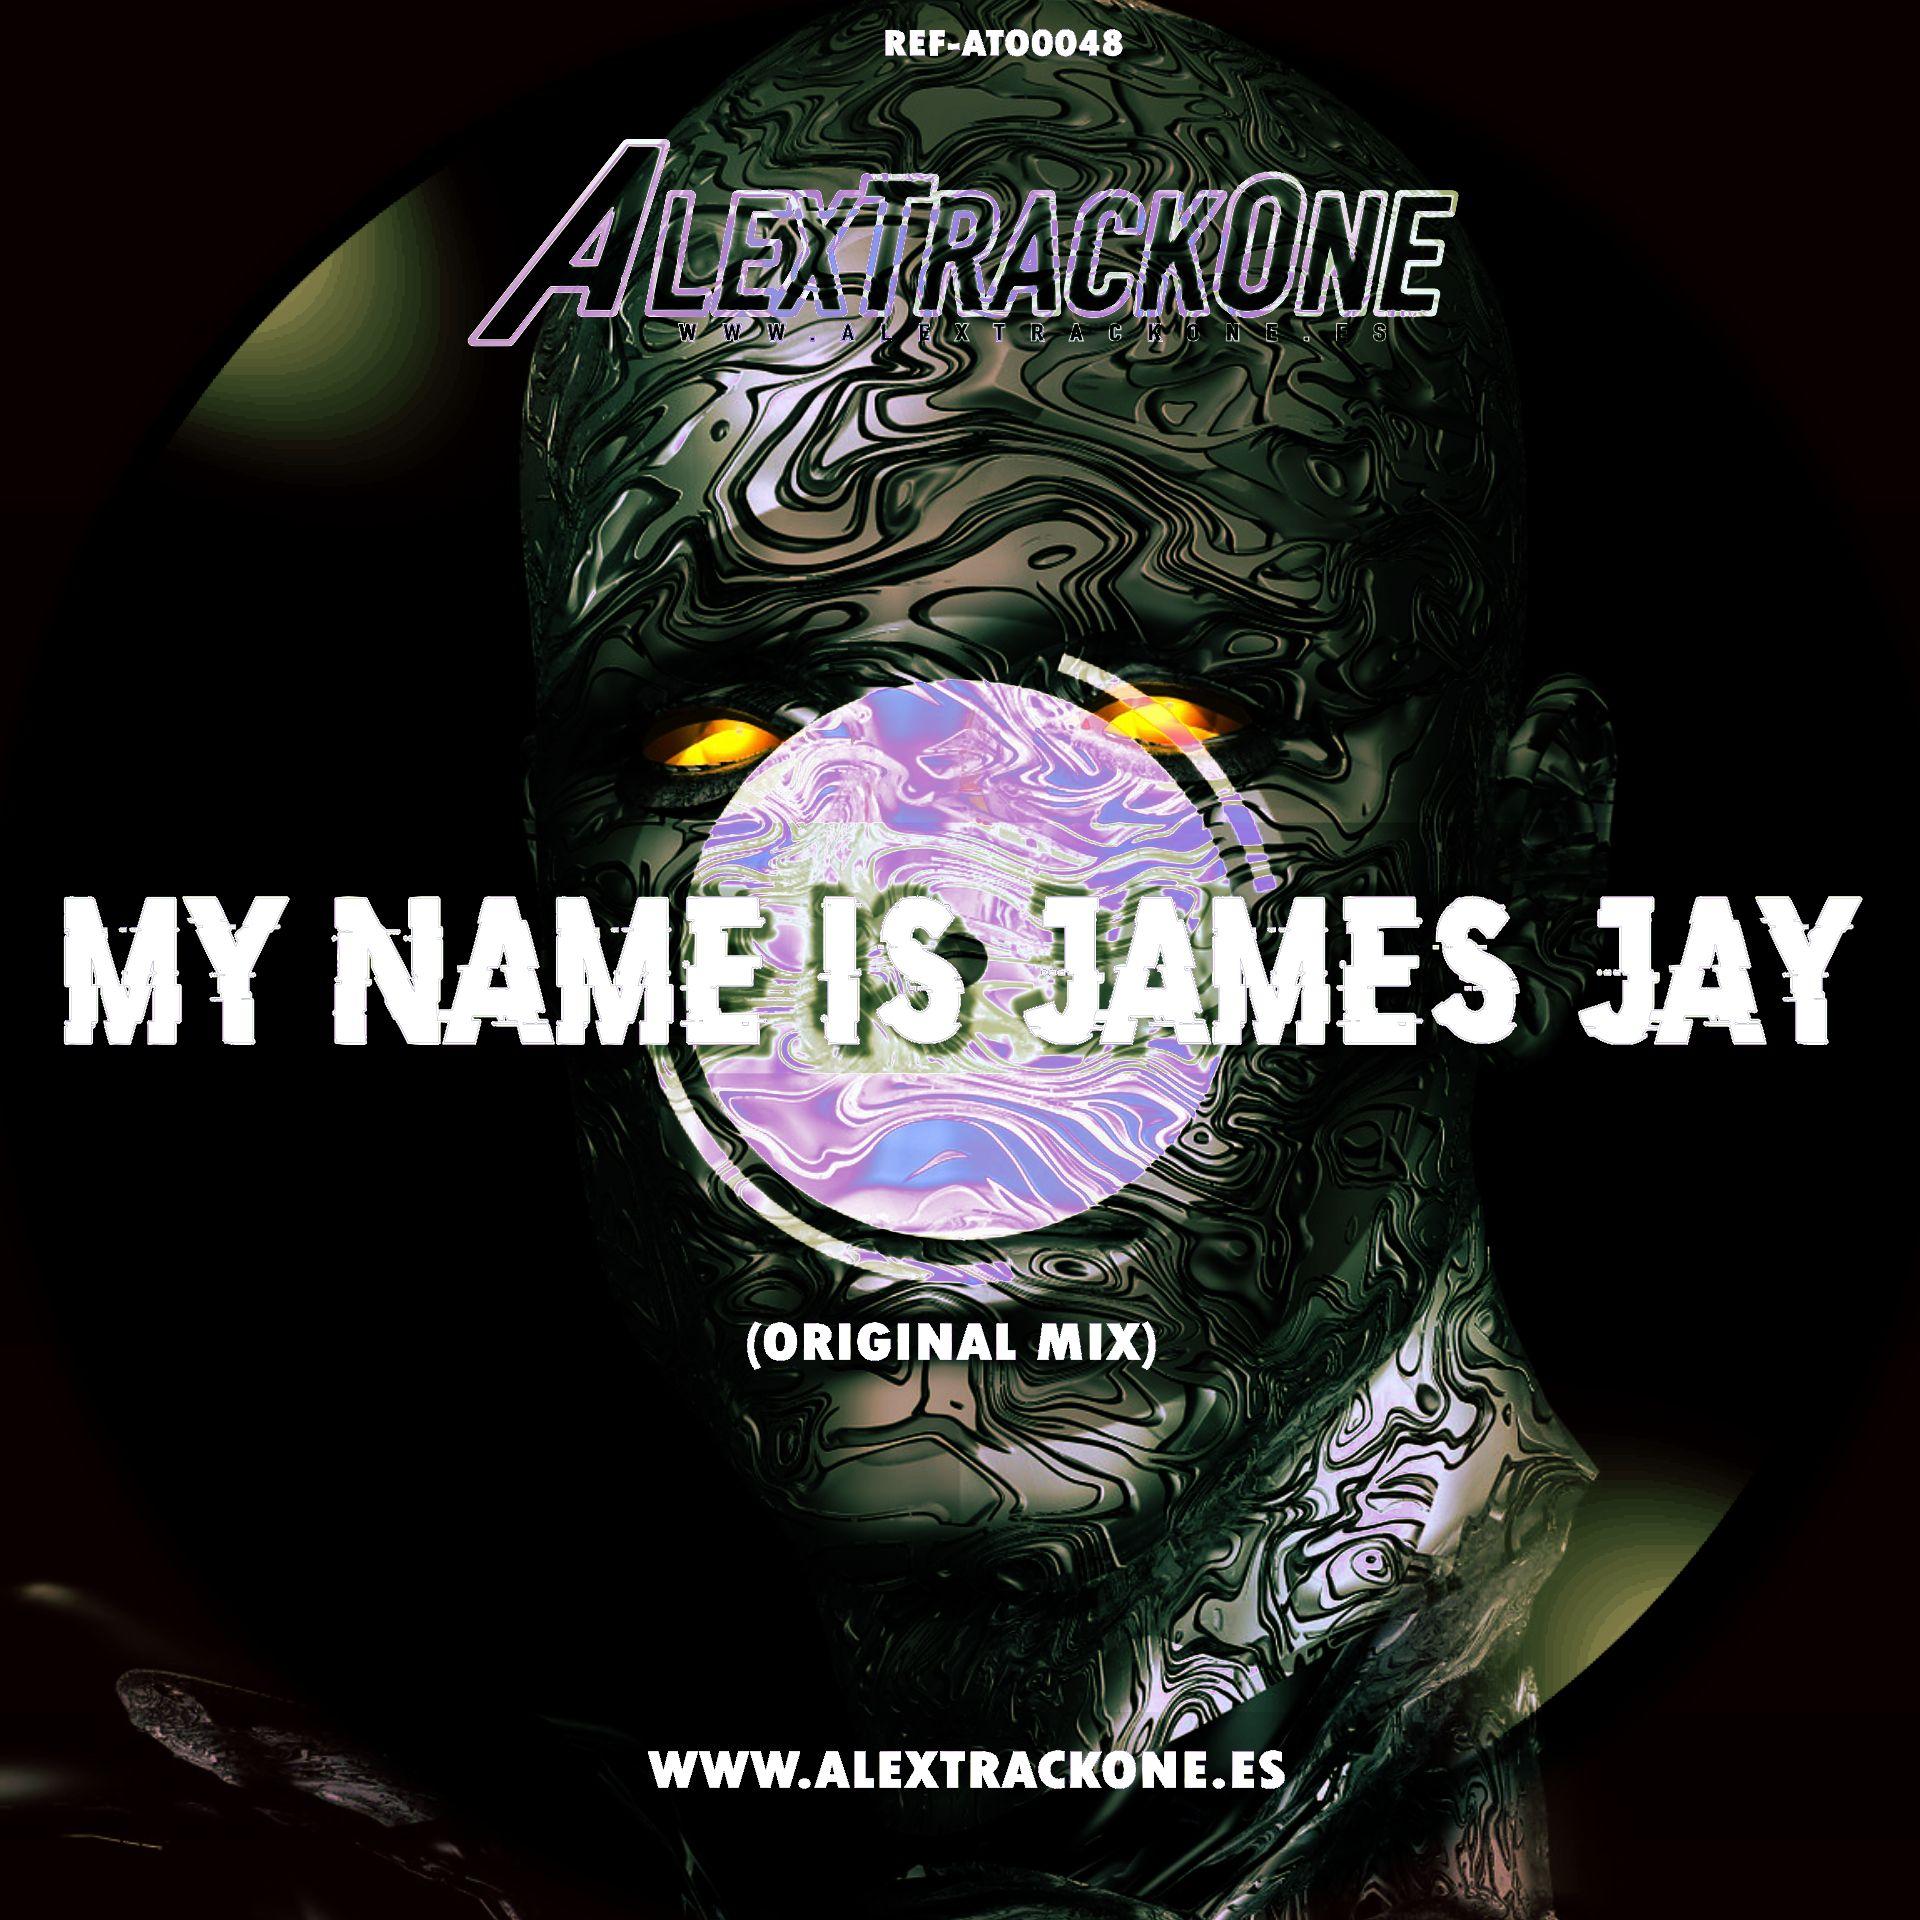 REF-ATO0048 MY NAME IS JAMES JAY (ORIGINAL MIX) (MP3 & WAV)